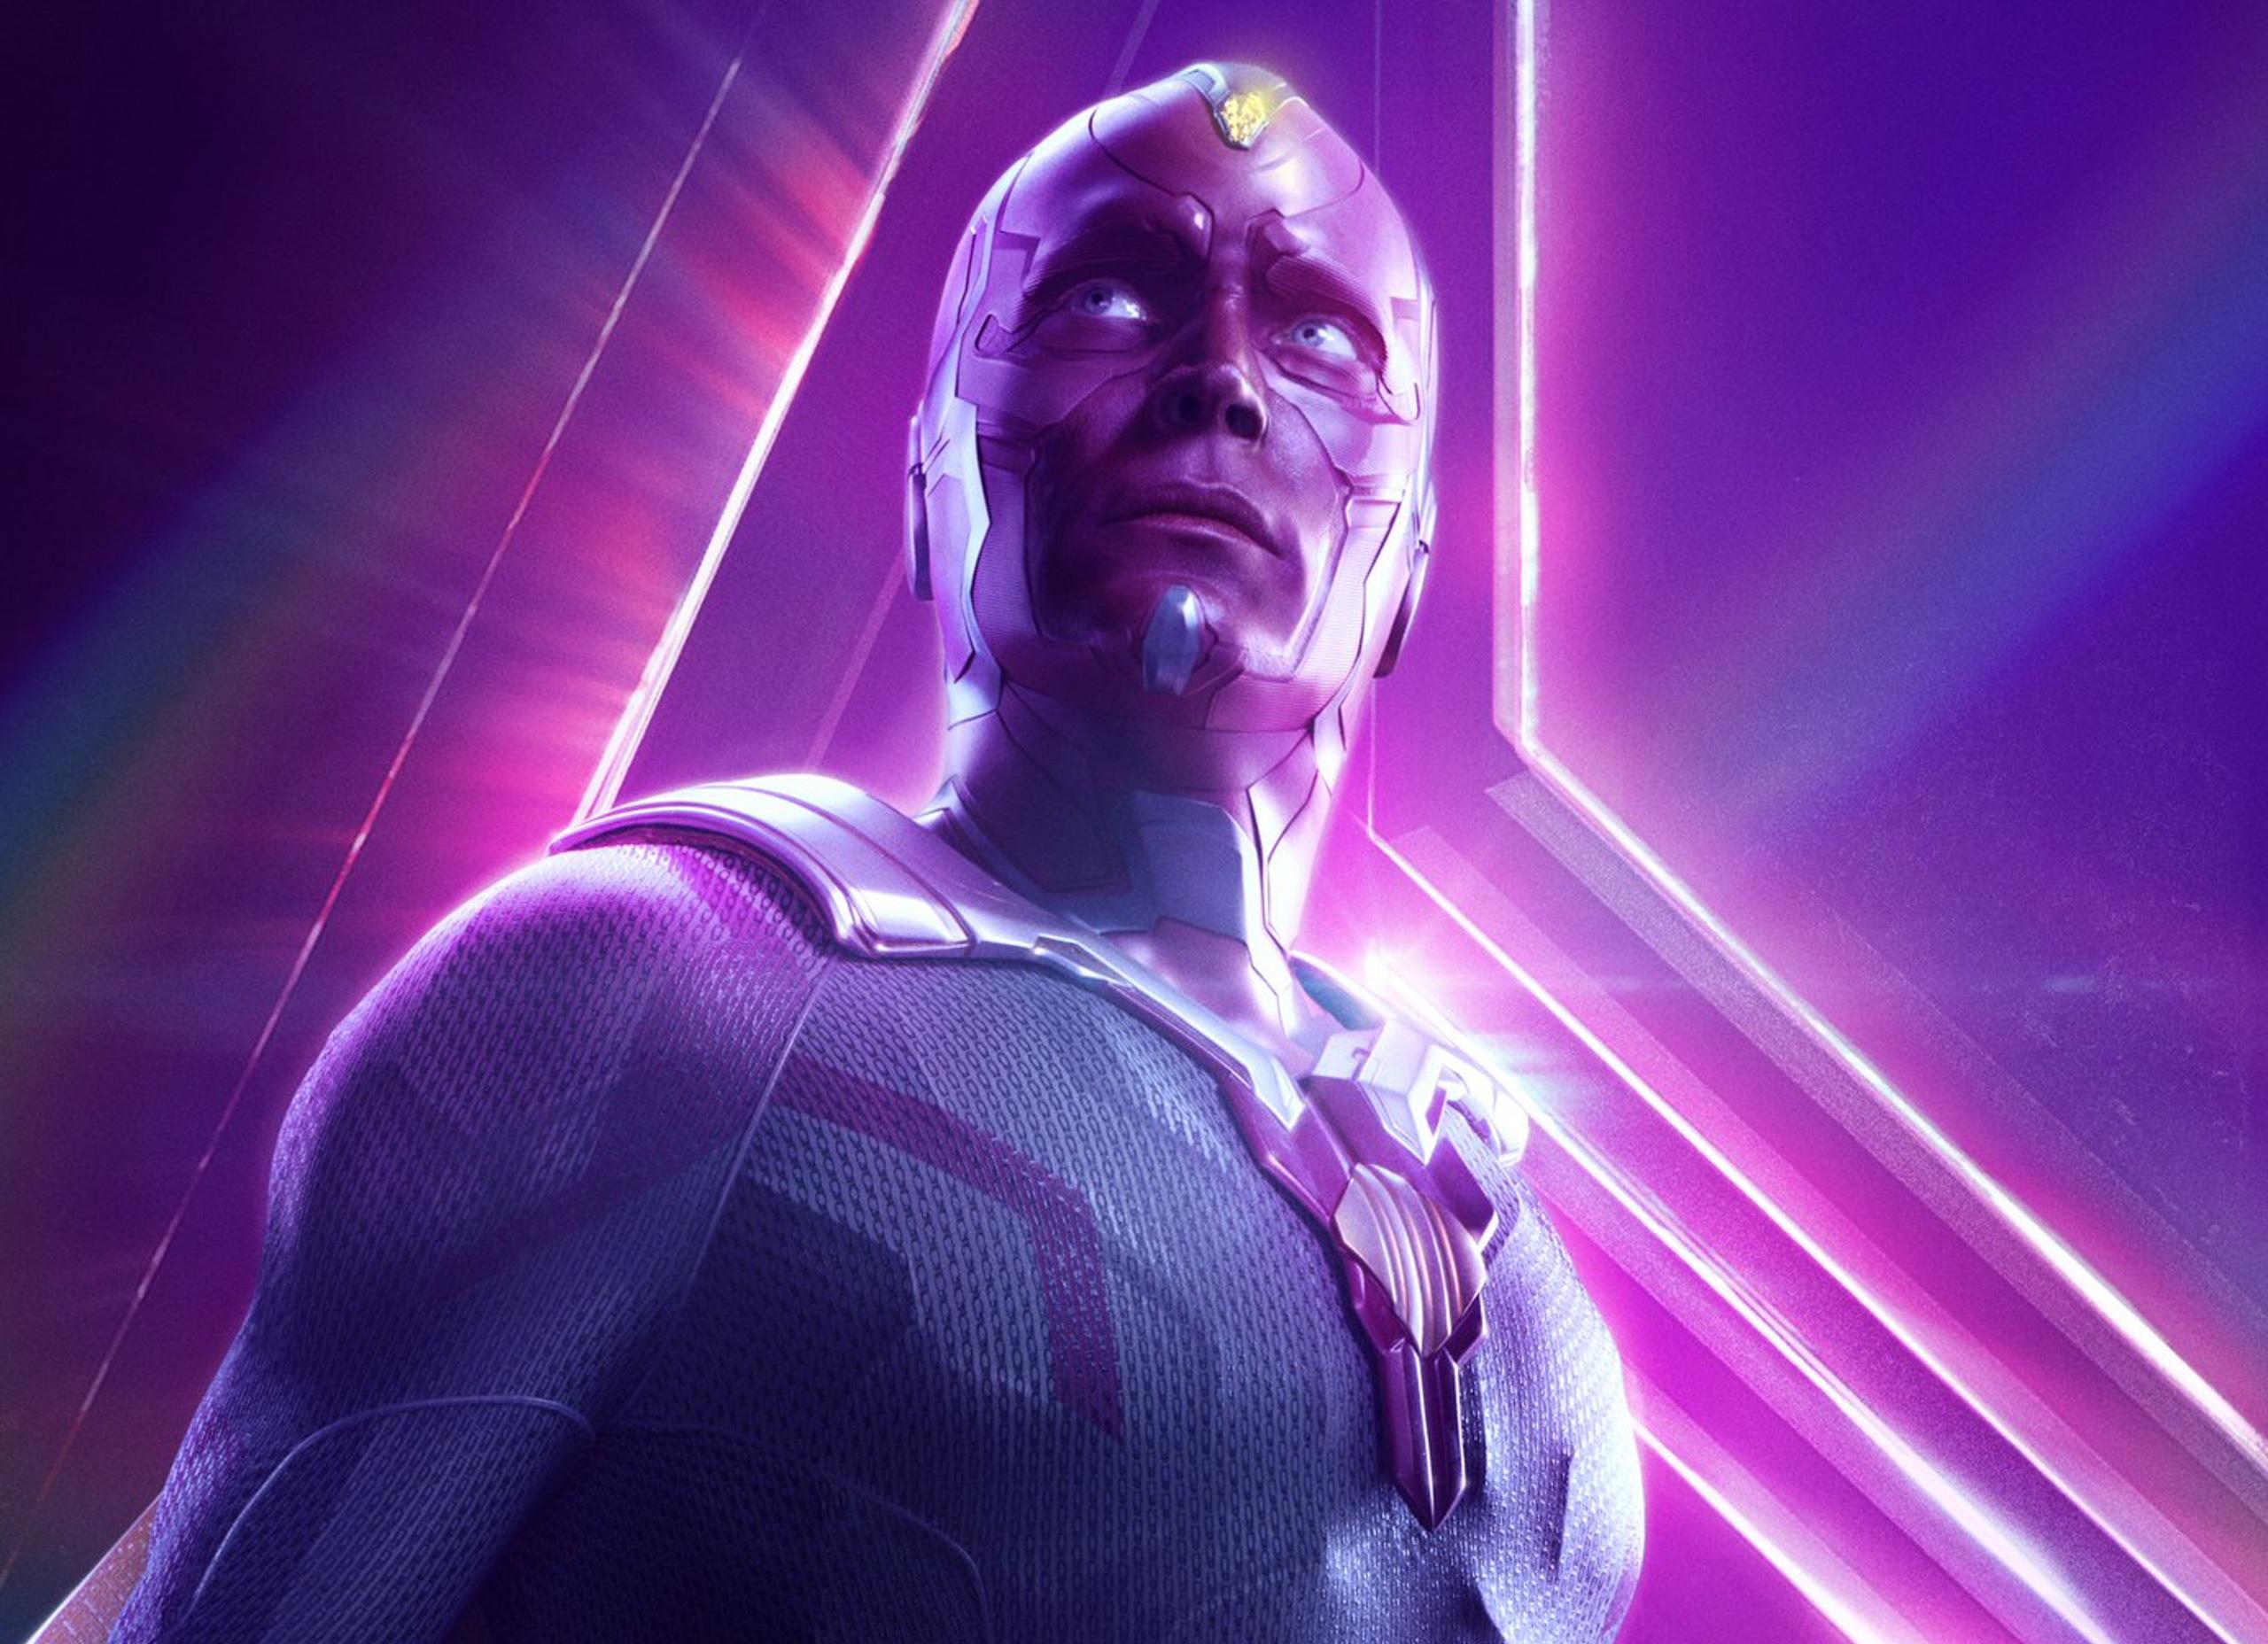 Shuri In Avengers Infinity War New Poster Hd Movies 4k: Vision In Avengers Infinity War New Poster, HD Movies, 4k